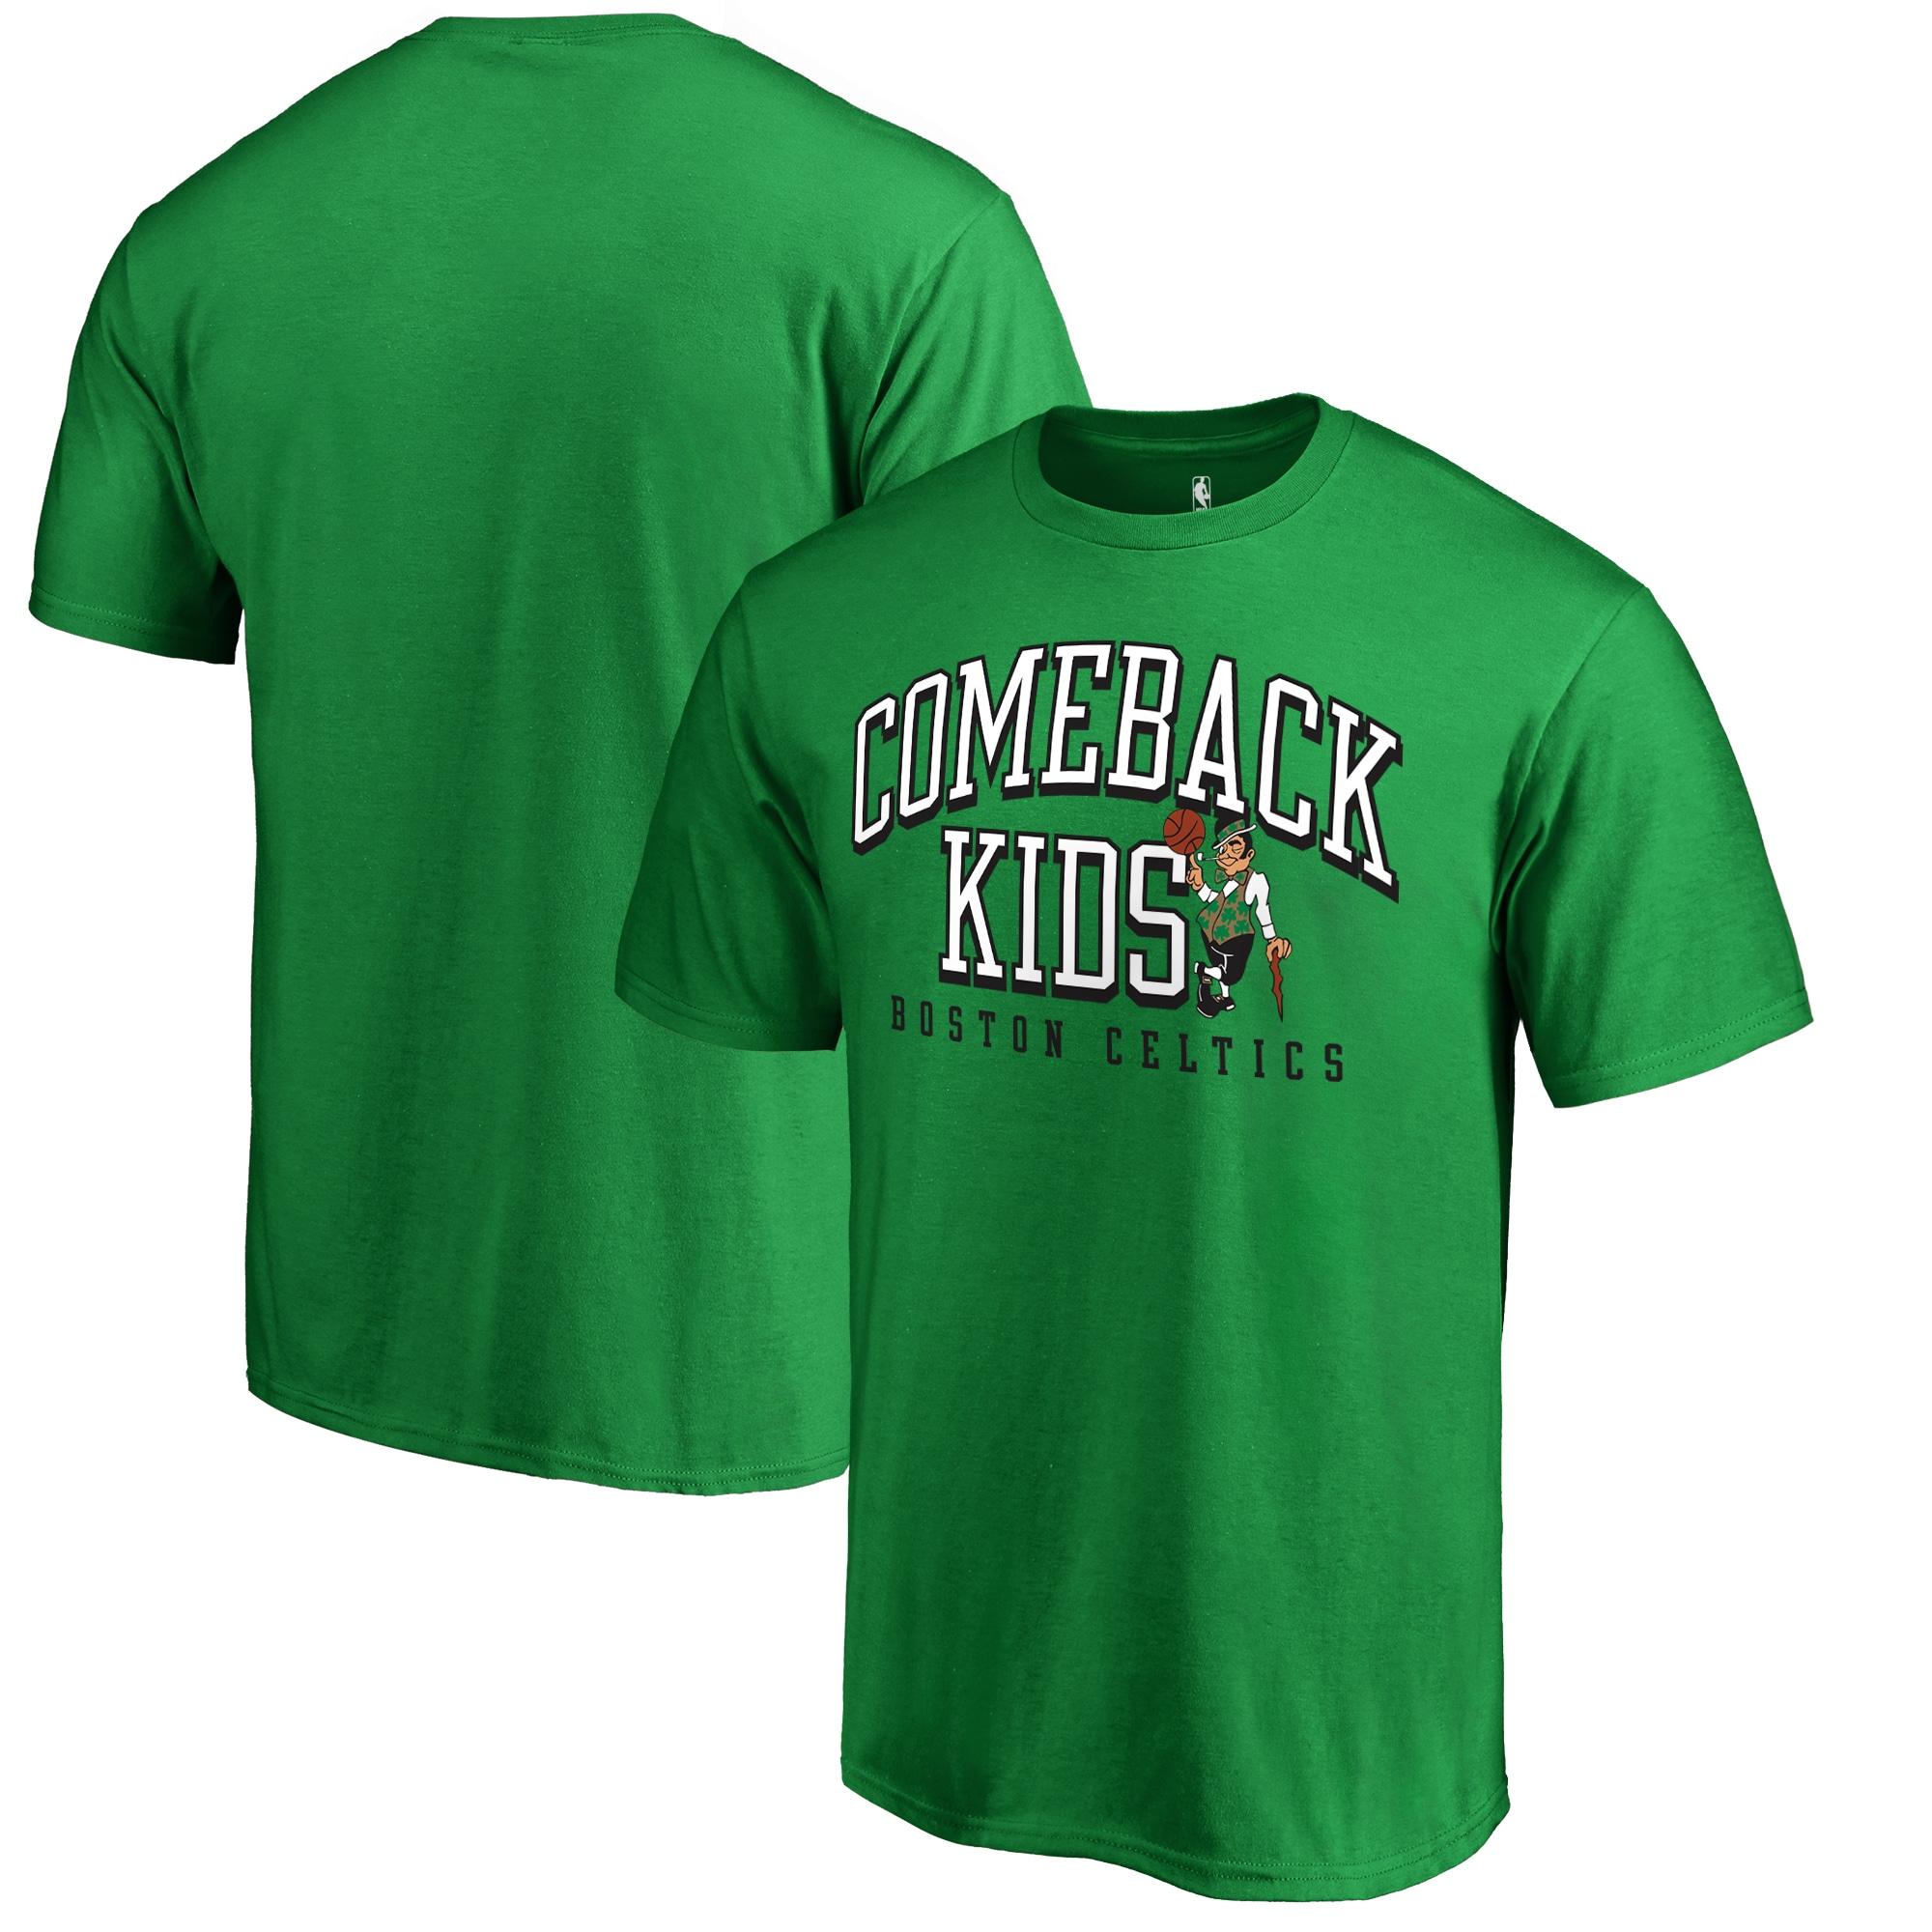 Boston Celtics Fanatics Branded Comeback Kids T-Shirt - Kelly Green